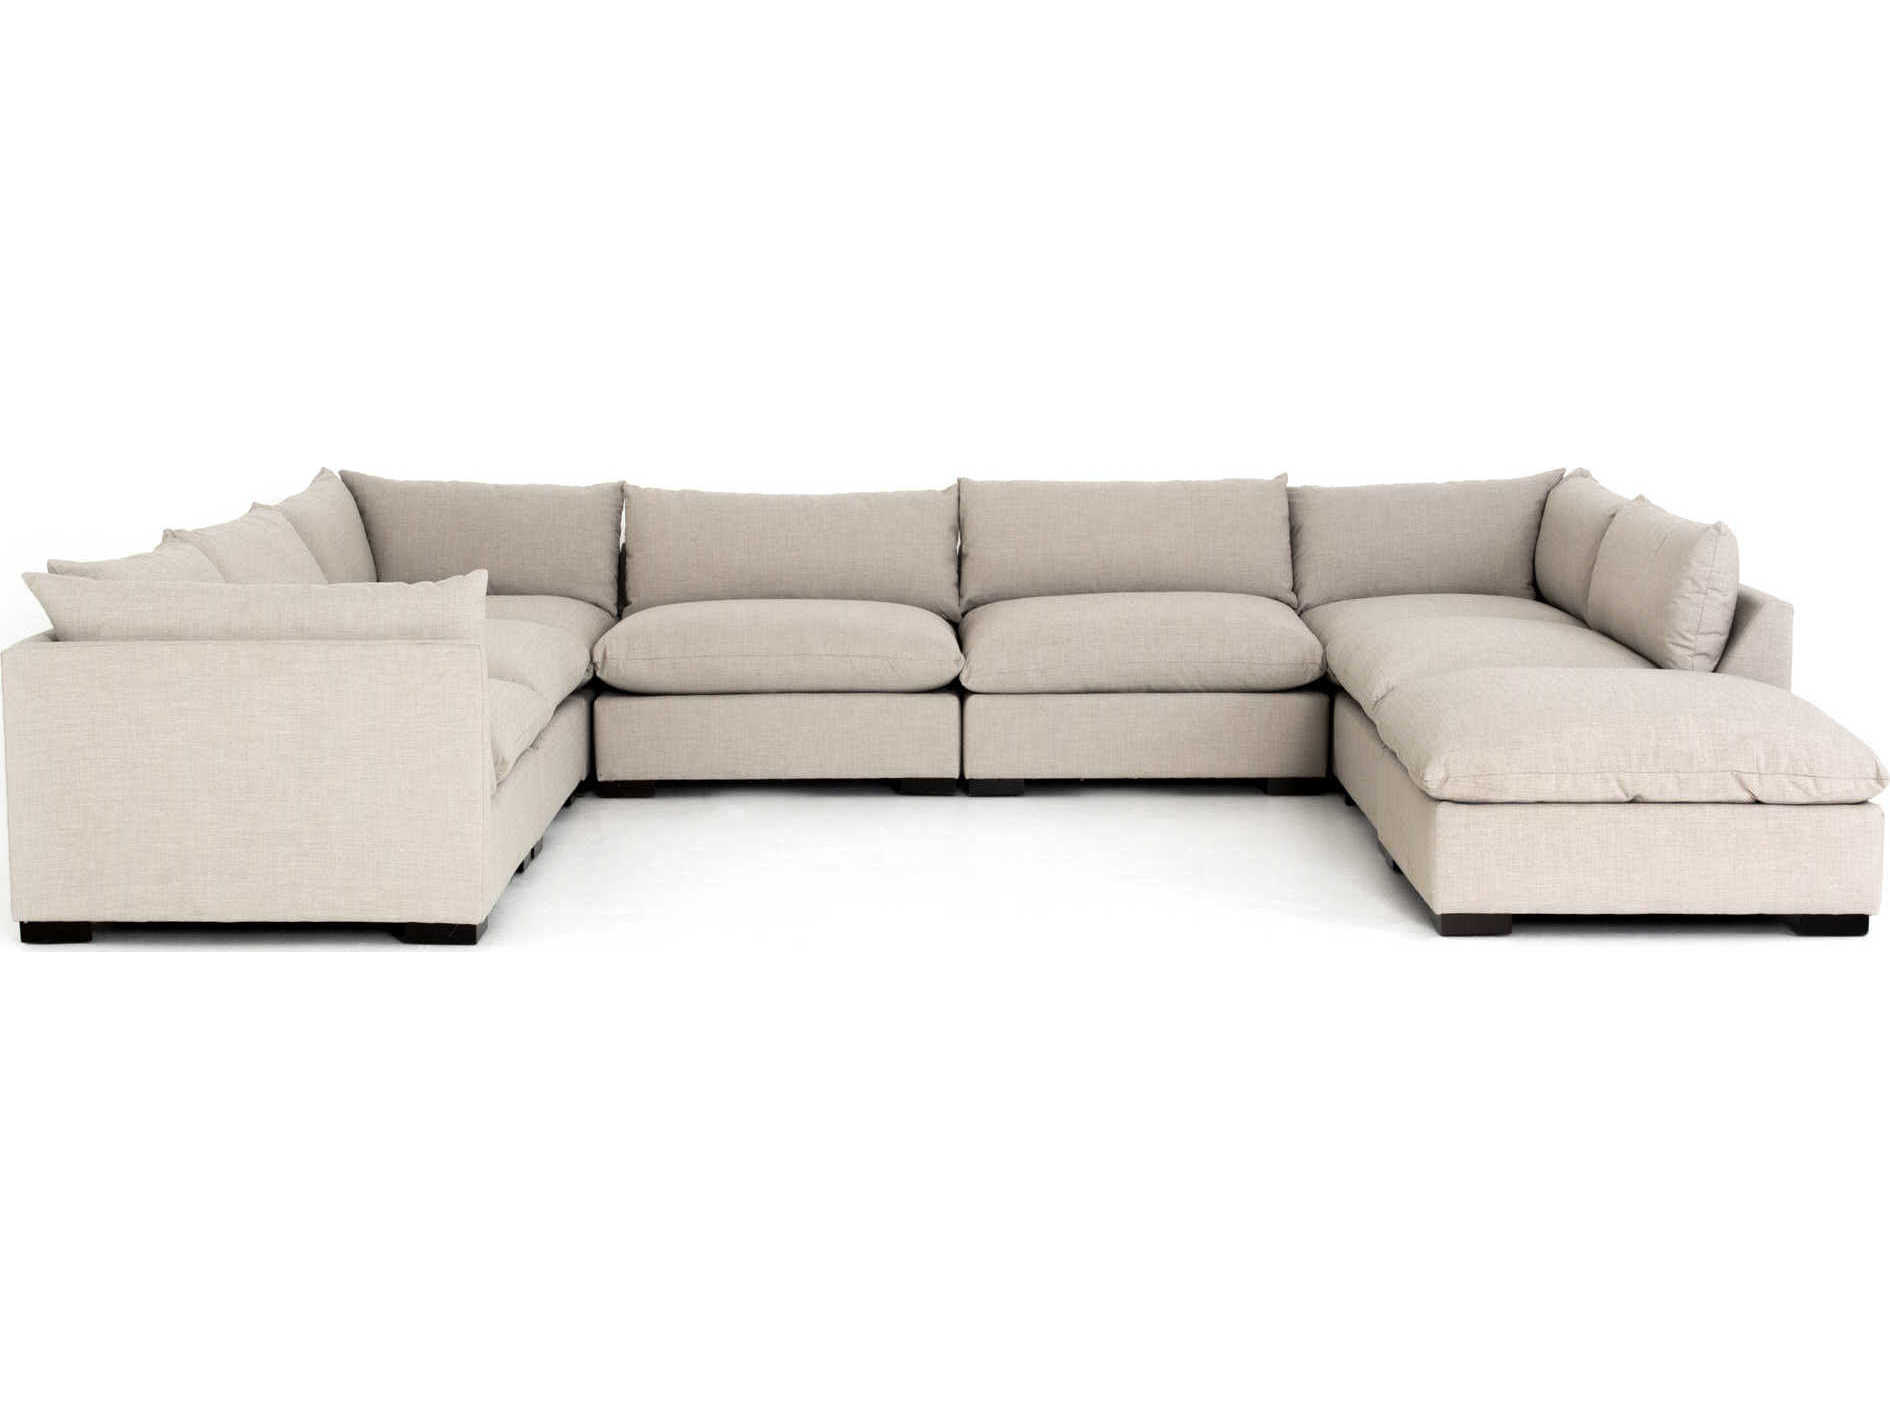 four hands atelier espresso bennett moon sectional sofa